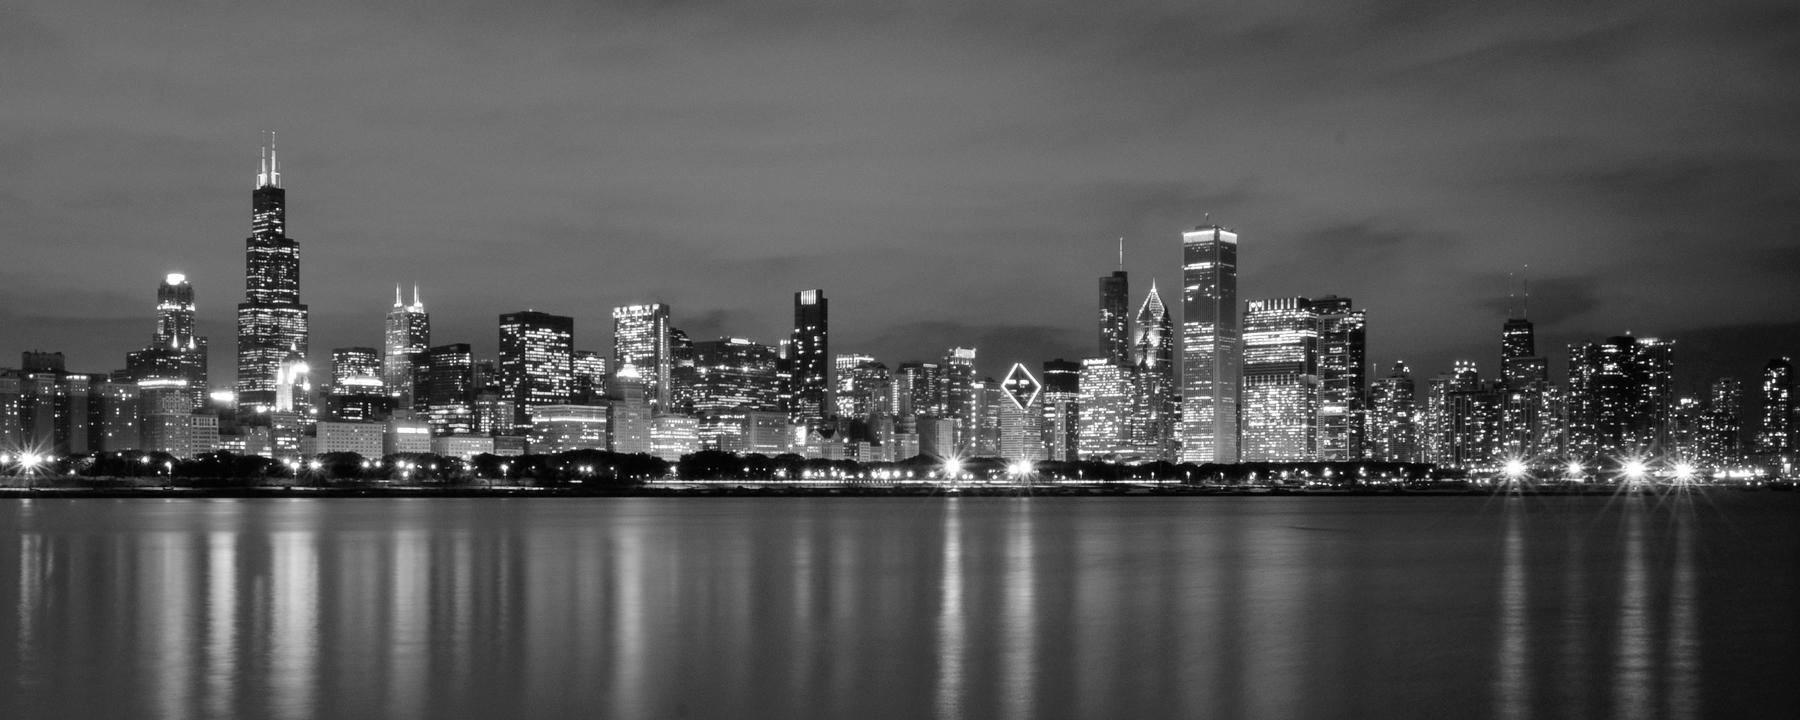 black and white chicago skyline